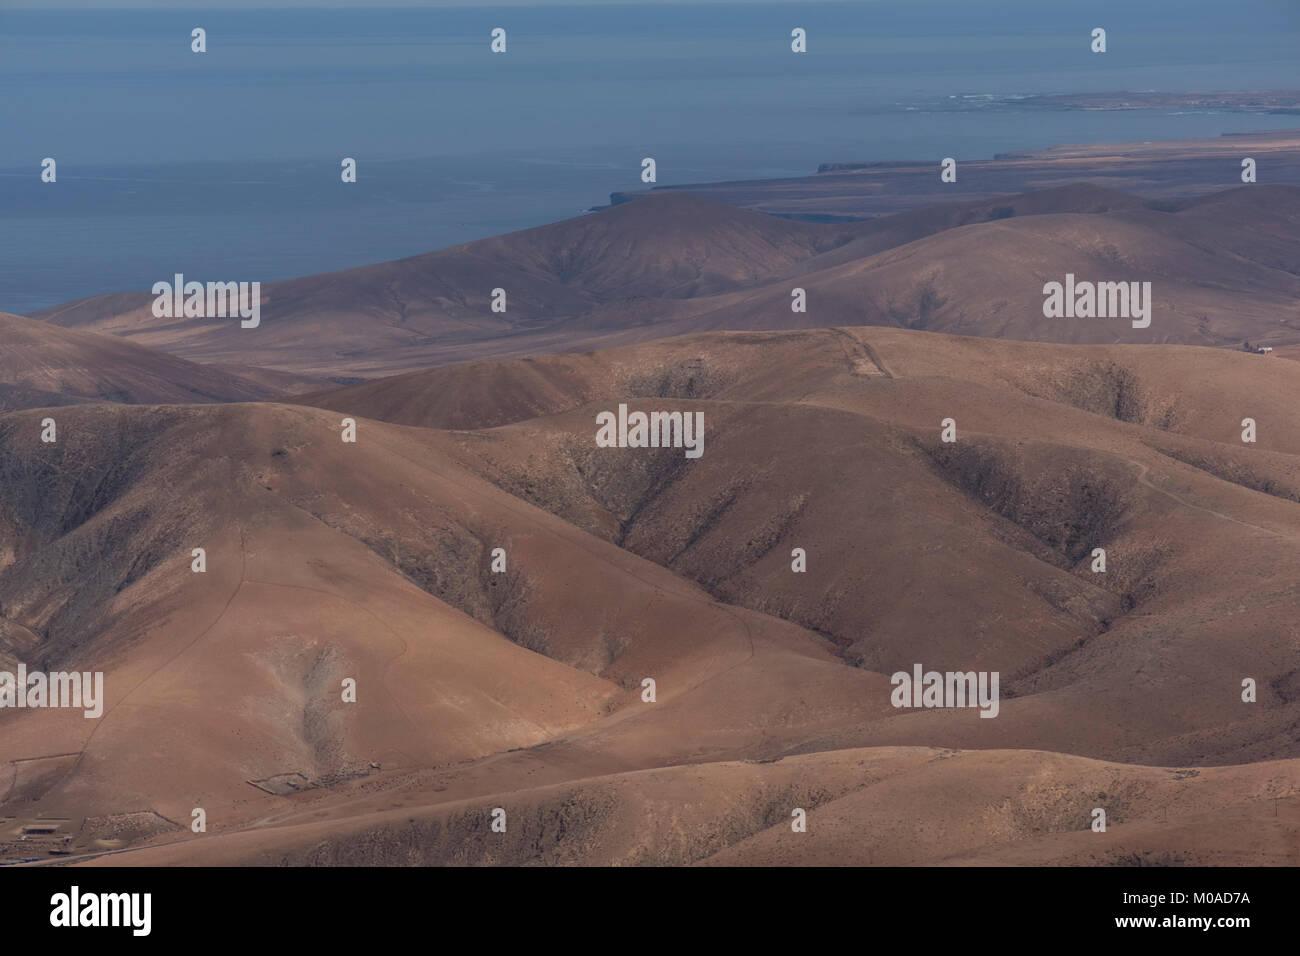 Desert landscape, Fuerteventura,Canary Islands,Spain - Stock Image